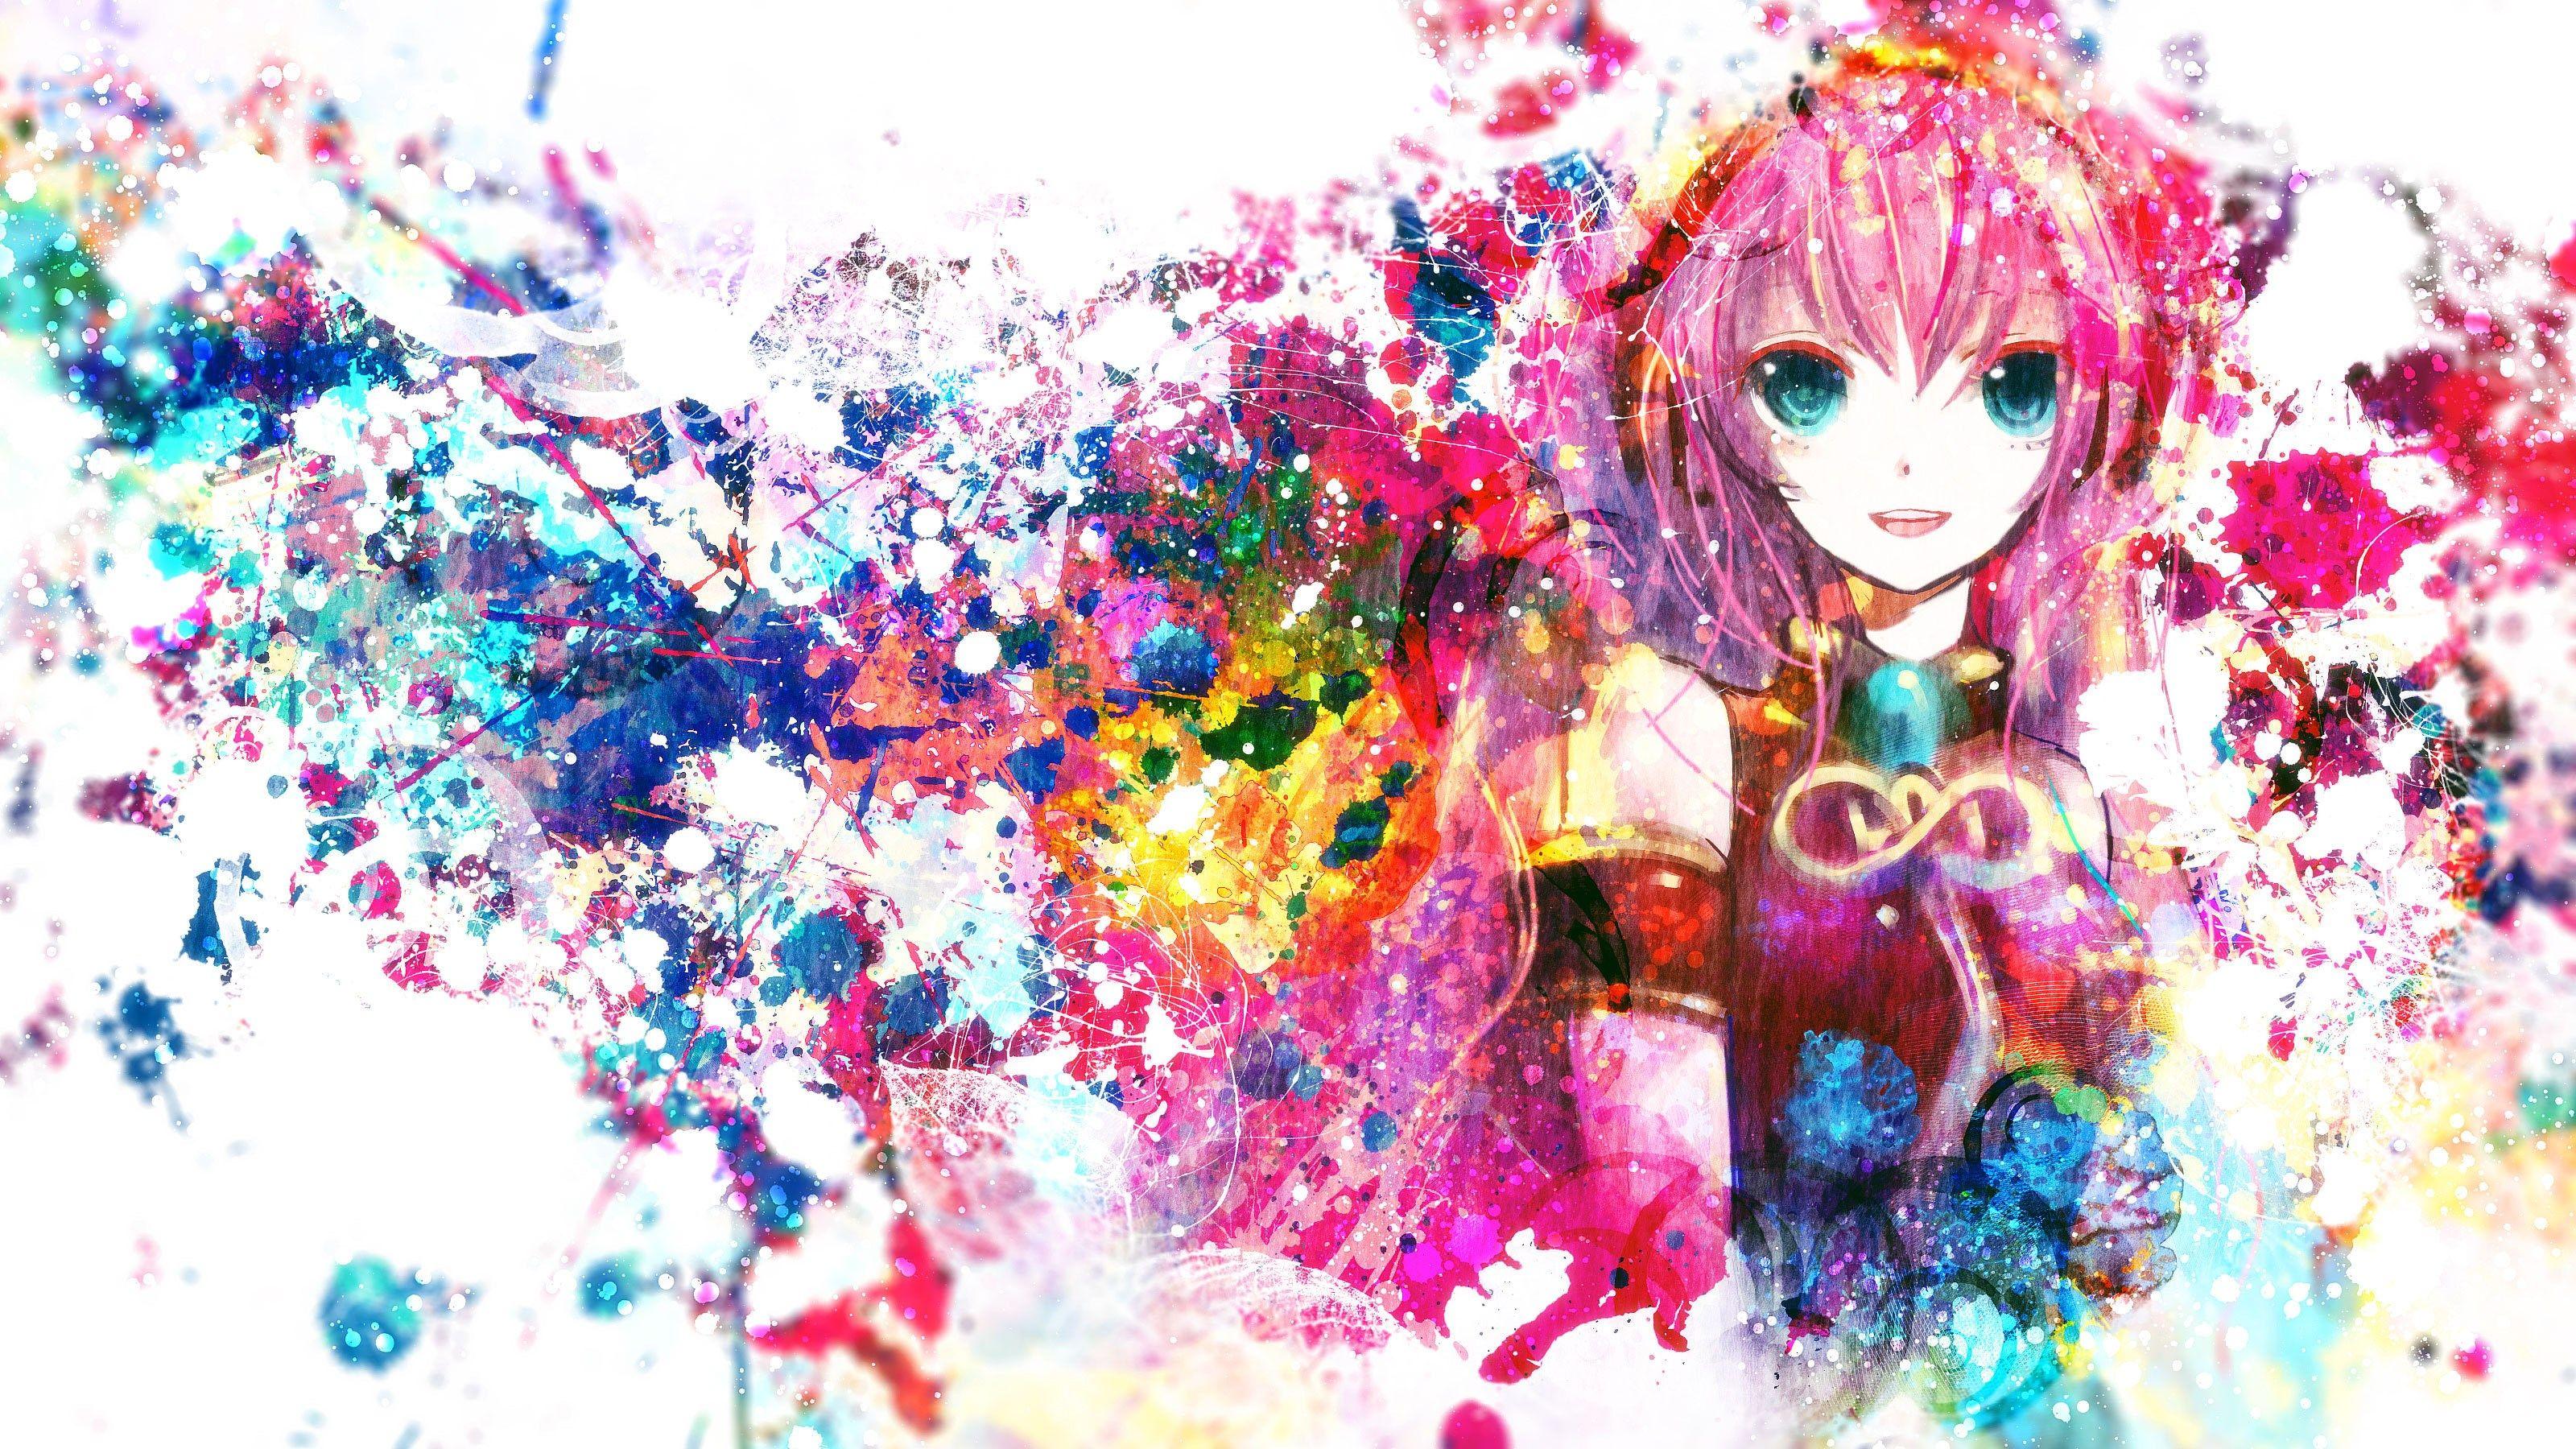 3200x1800 Wallpaper For Desktop Vocaloid Anime Wallpaper Anime